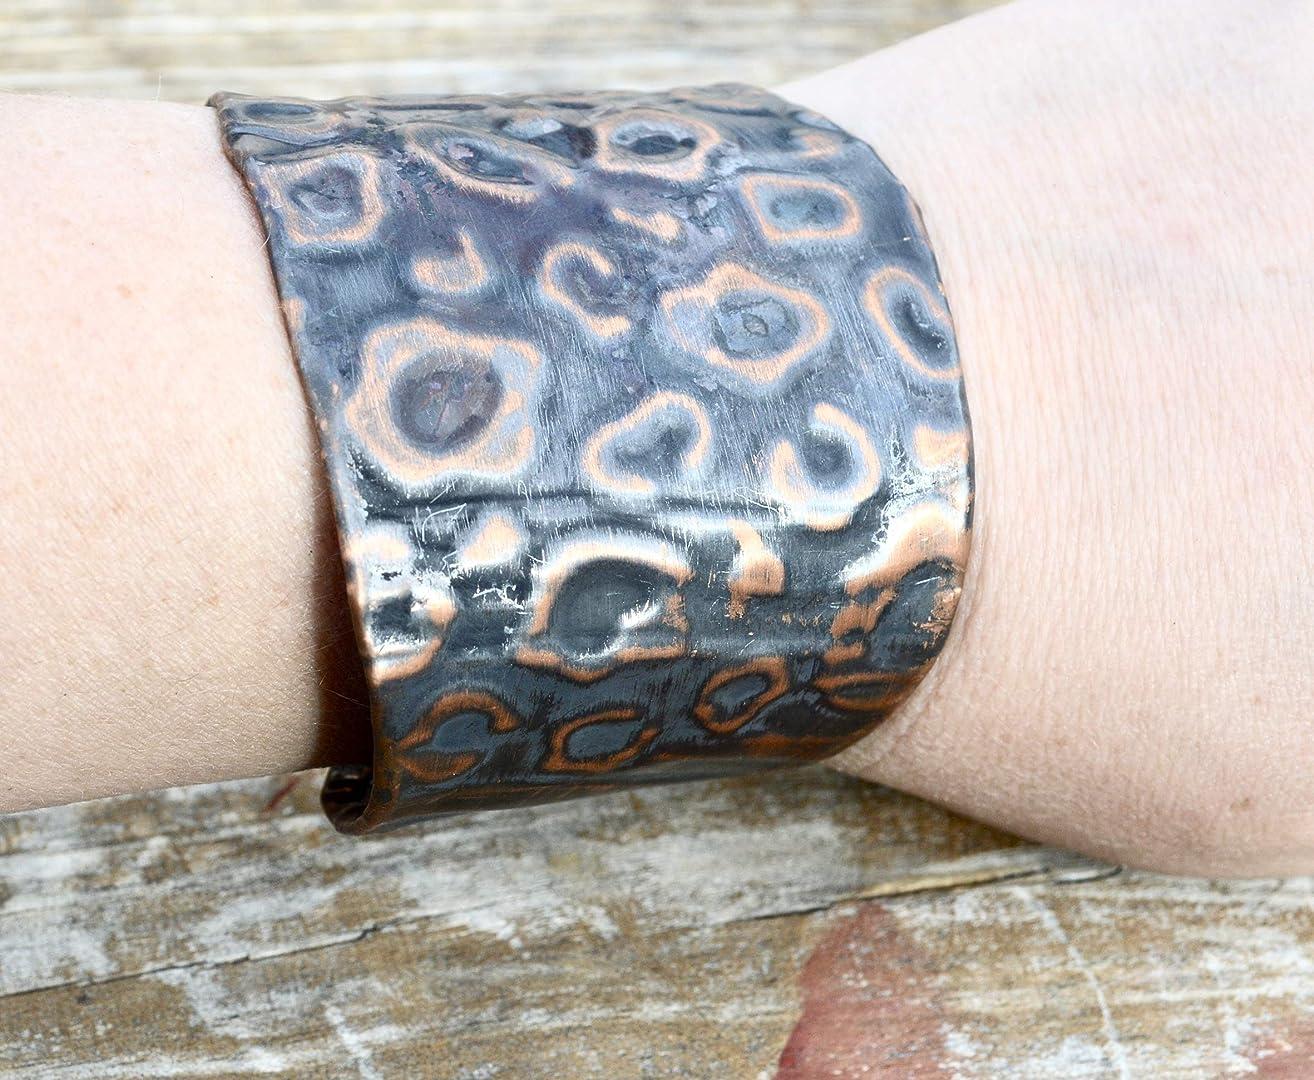 Leopard Cheetah Cat Zebra Skin Print Unisex Copper Contemporary Industrial Southwestern Embossed Handmade Cuff Bracelet Renaissance Steampunk Statement Gothic